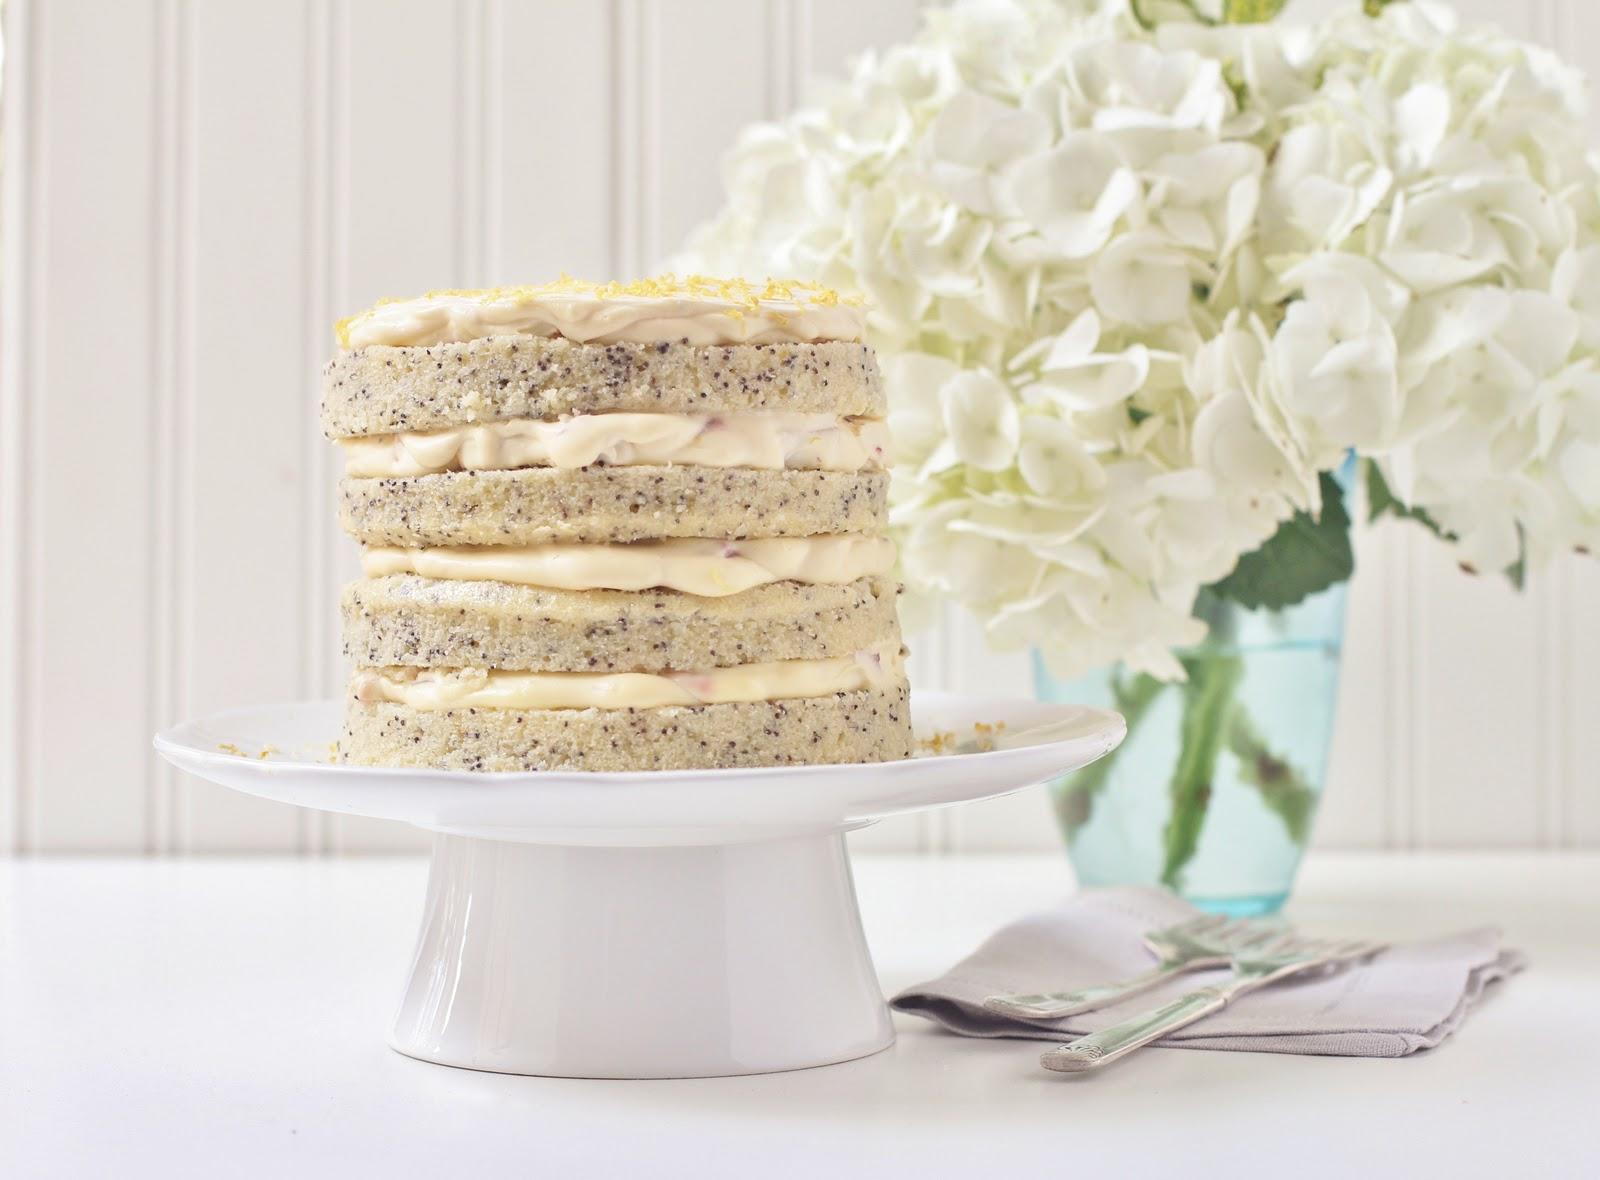 Lemon Poppy Seed Cake for My Birthday Beyond Sweet and Savory